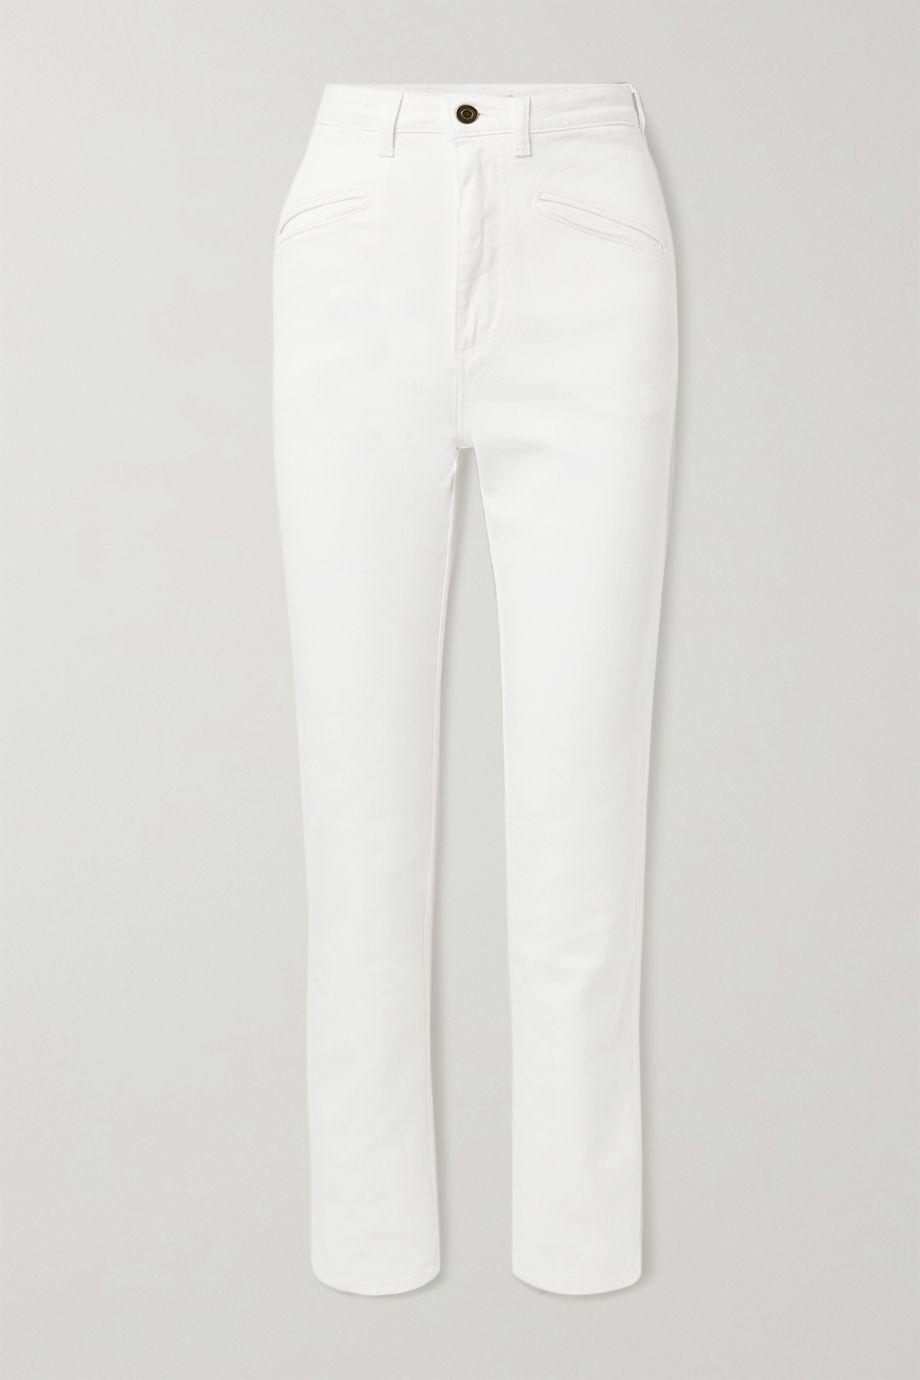 Philosophy di Lorenzo Serafini Mid-rise straight-leg jeans